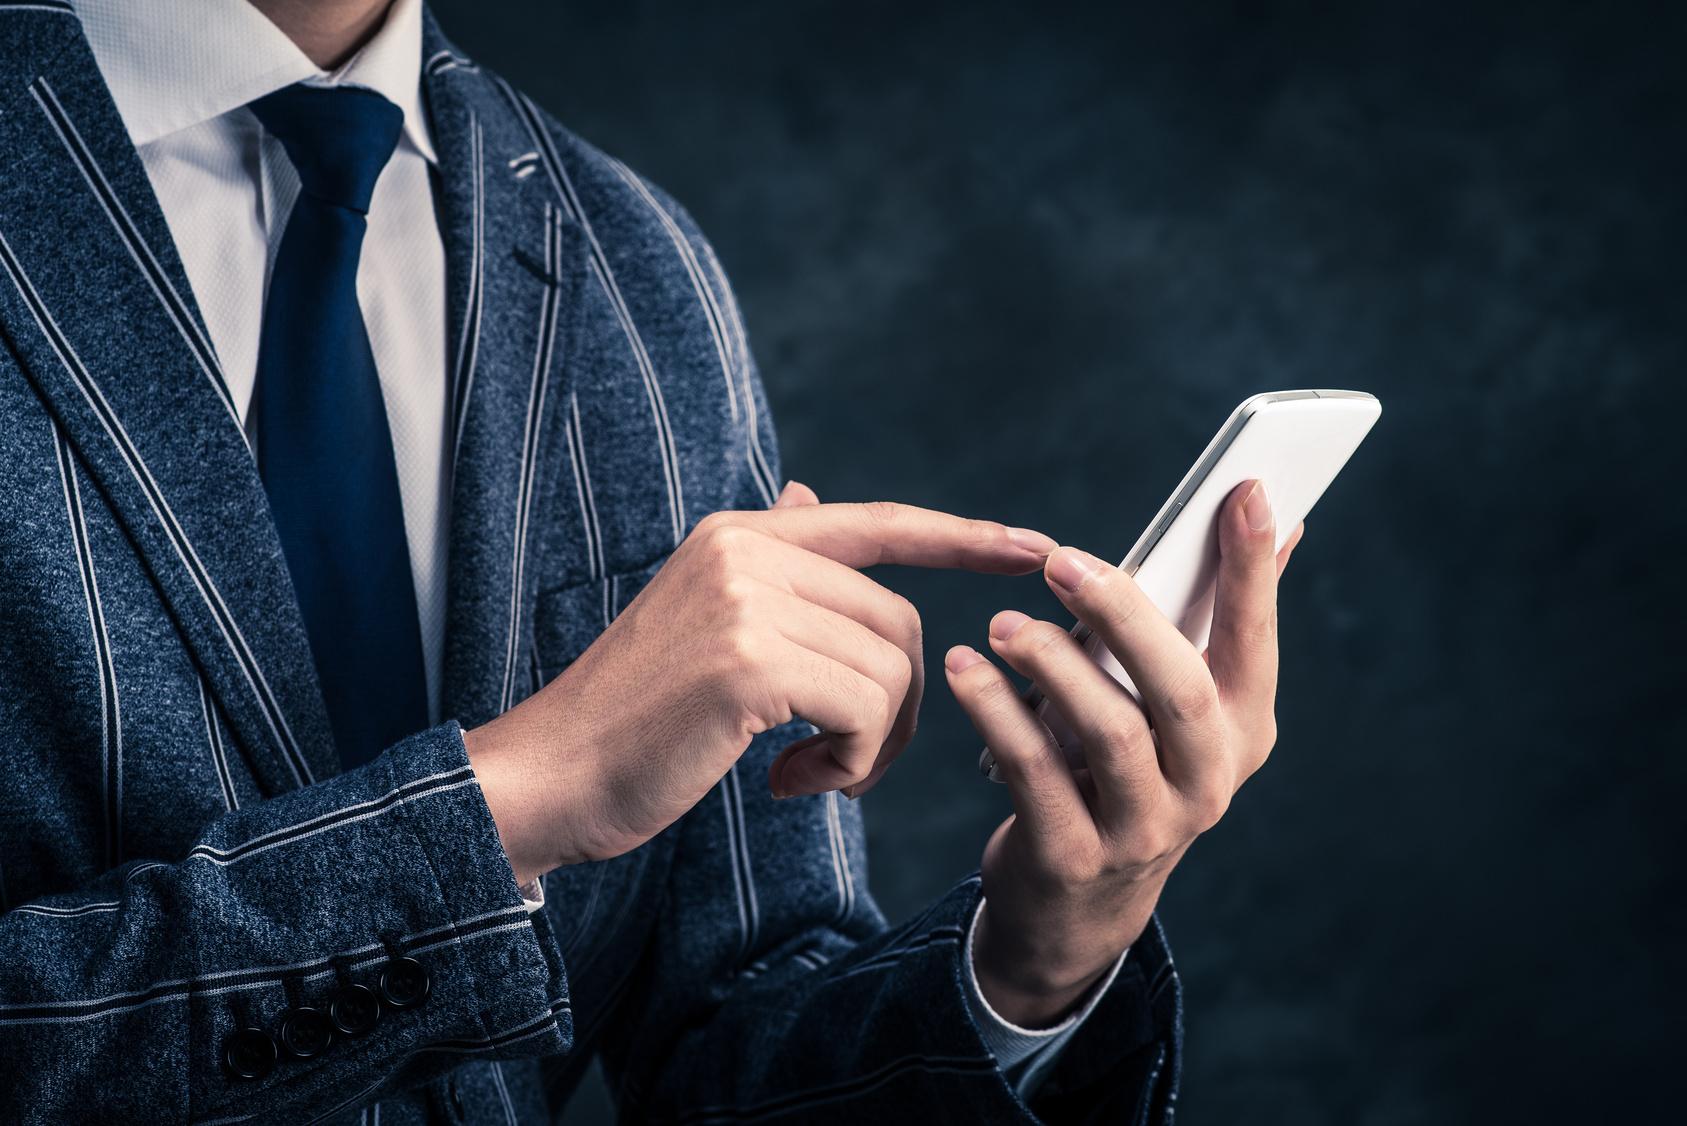 GEに導入された、新たな上司・部下間のカジュアルなレビュー/コミュニケーション手法